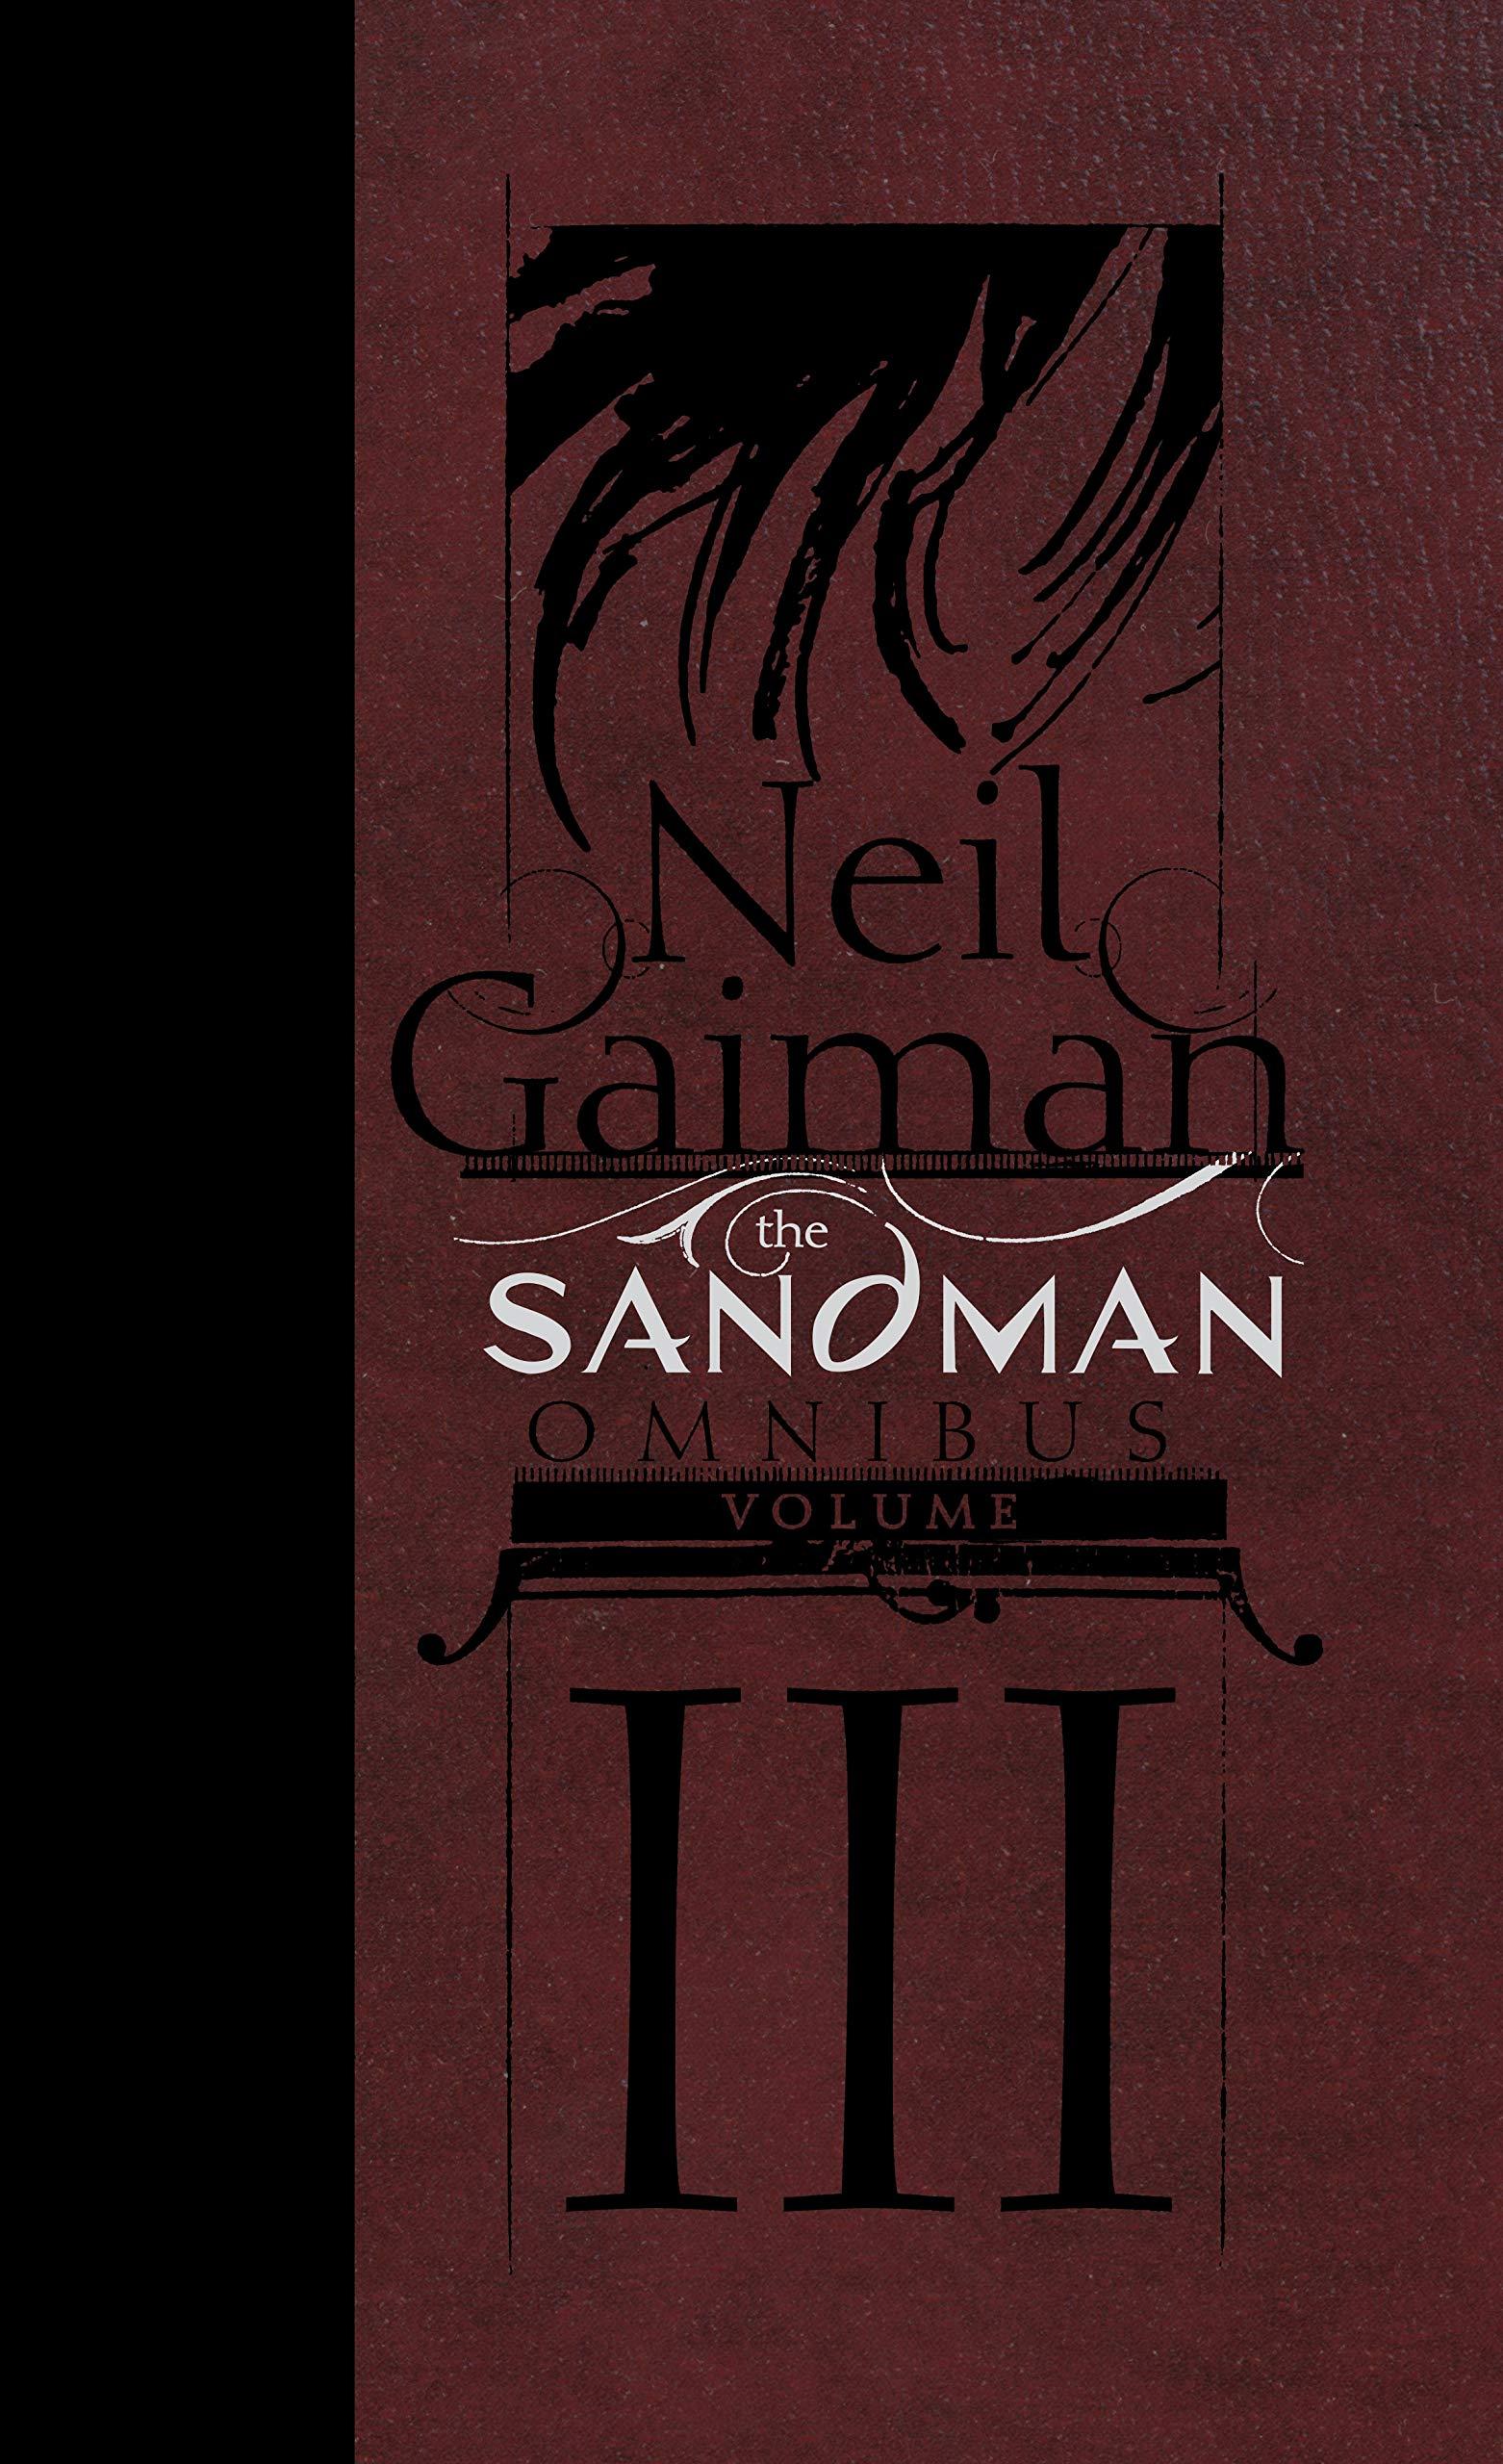 The Sandman Omnibus Vol. 3 by Vertigo